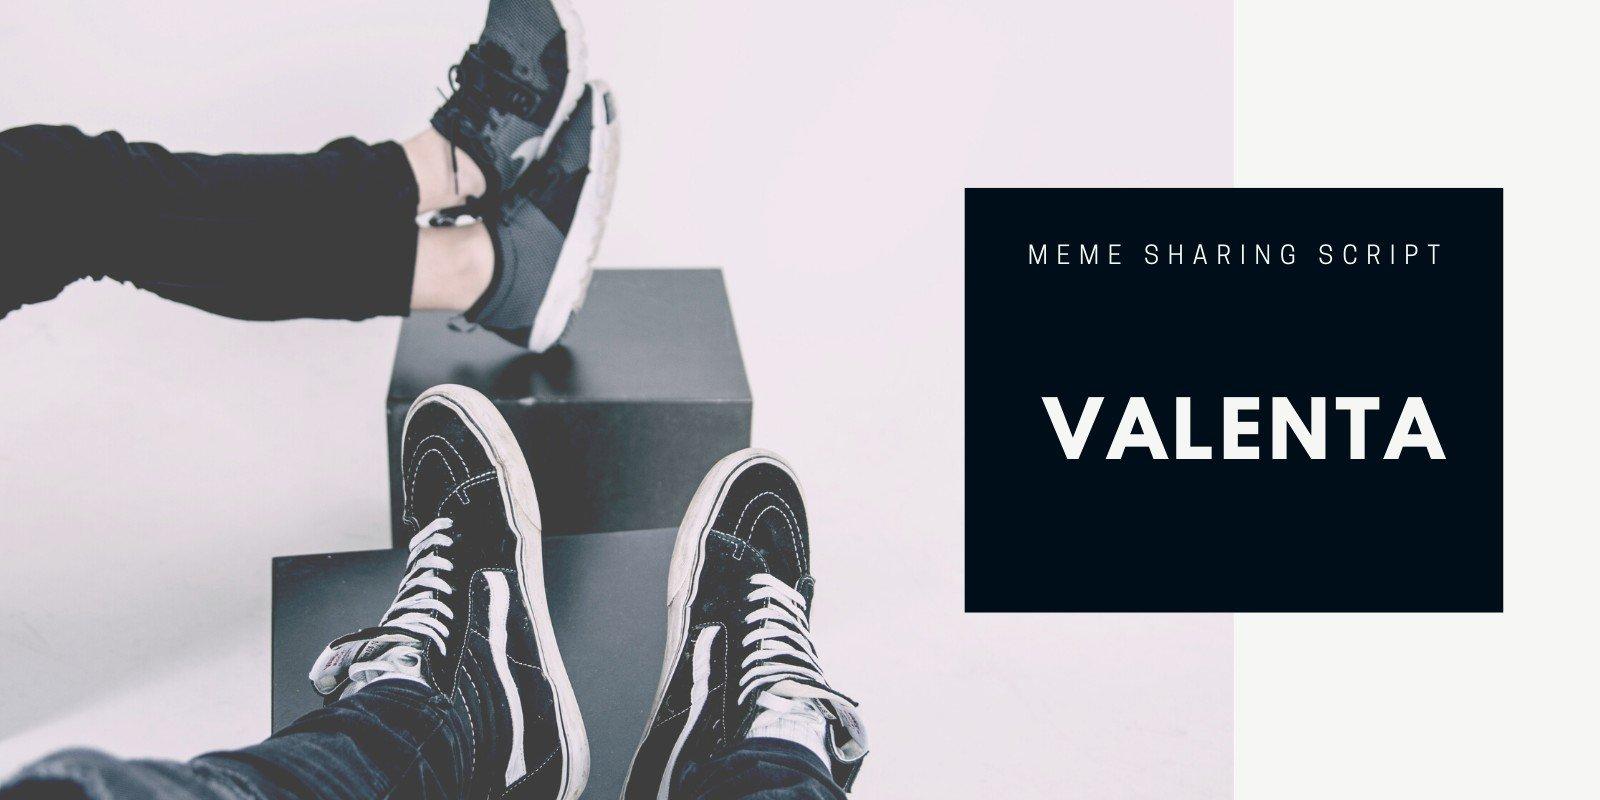 Valenta - Funny Meme And Video Sharing Script